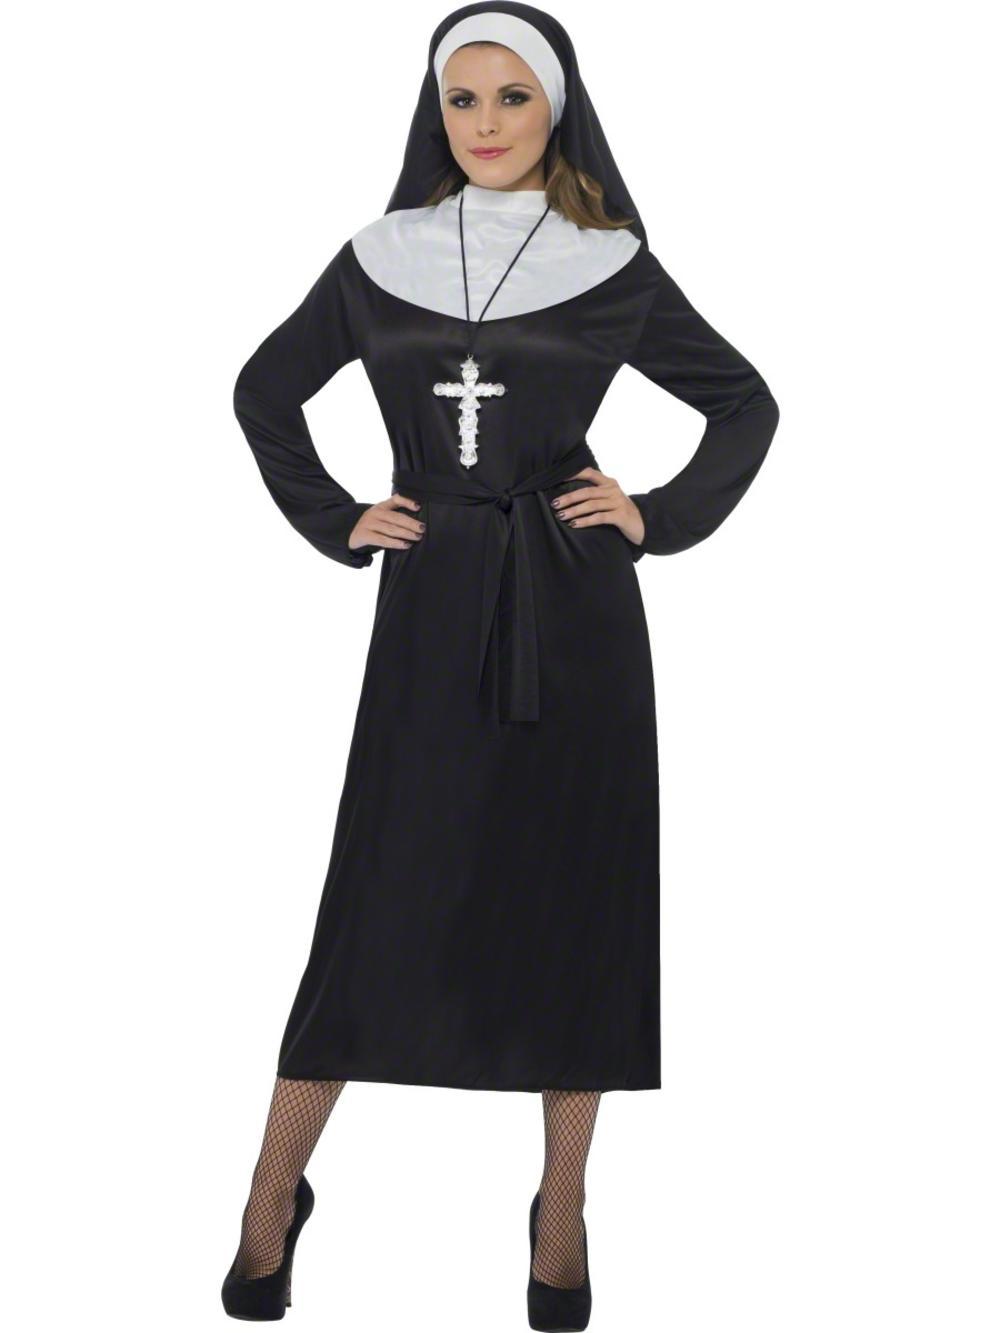 Nun Ladies Fancy Dress Hen Party Saints & Sinners Religious Womens Costume 10-16